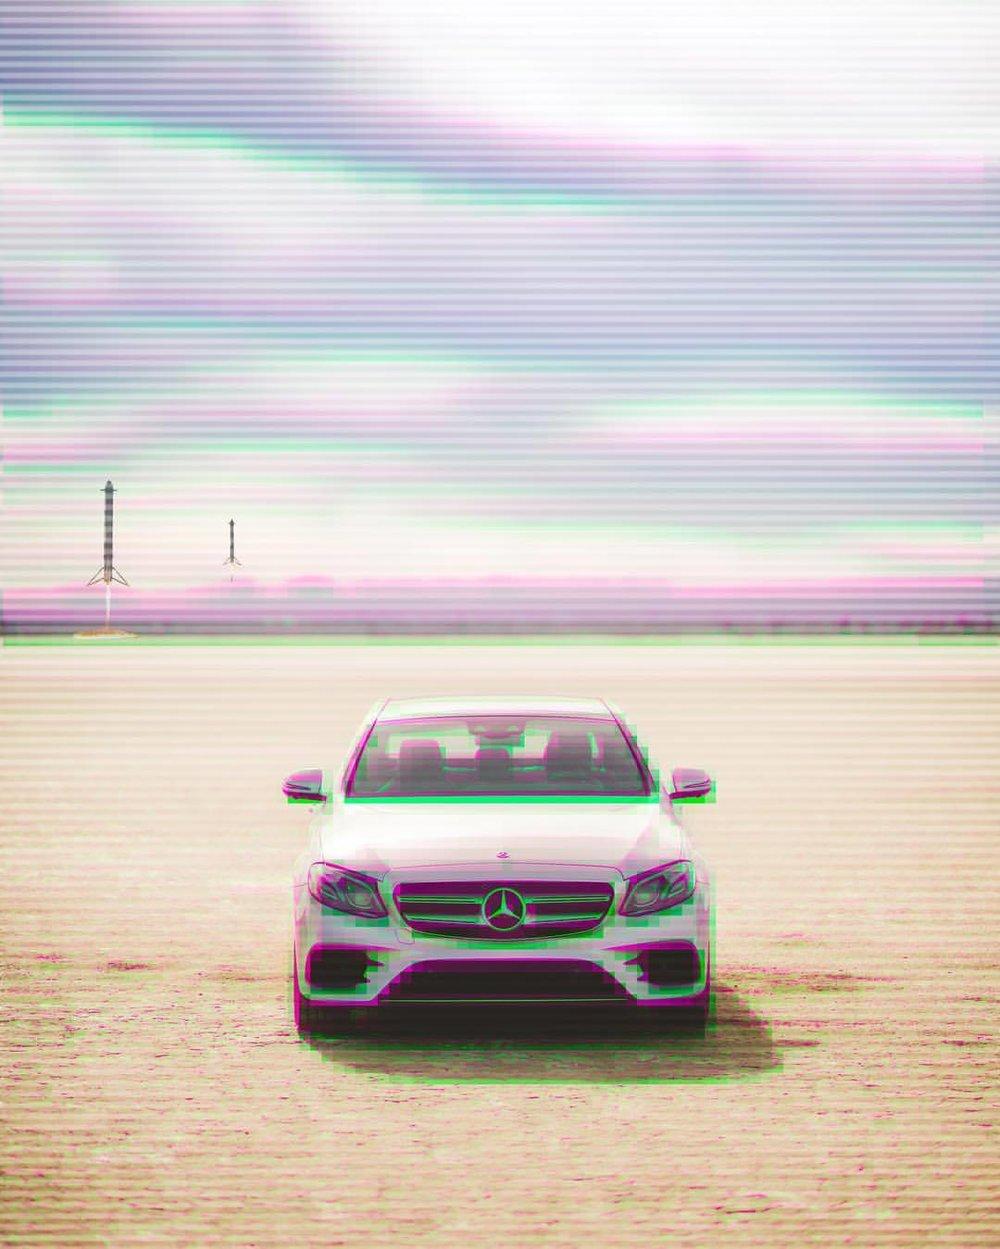 It's going to be O.K.   #mercedesbenz #e400 #elmirage #california #drylake #thefuture #scanlines #instacars #carsofinstagram #desert #sunshine #funday #😳 #🔥 #💪🏽 #🌞🌞 (at El Mirage, California)